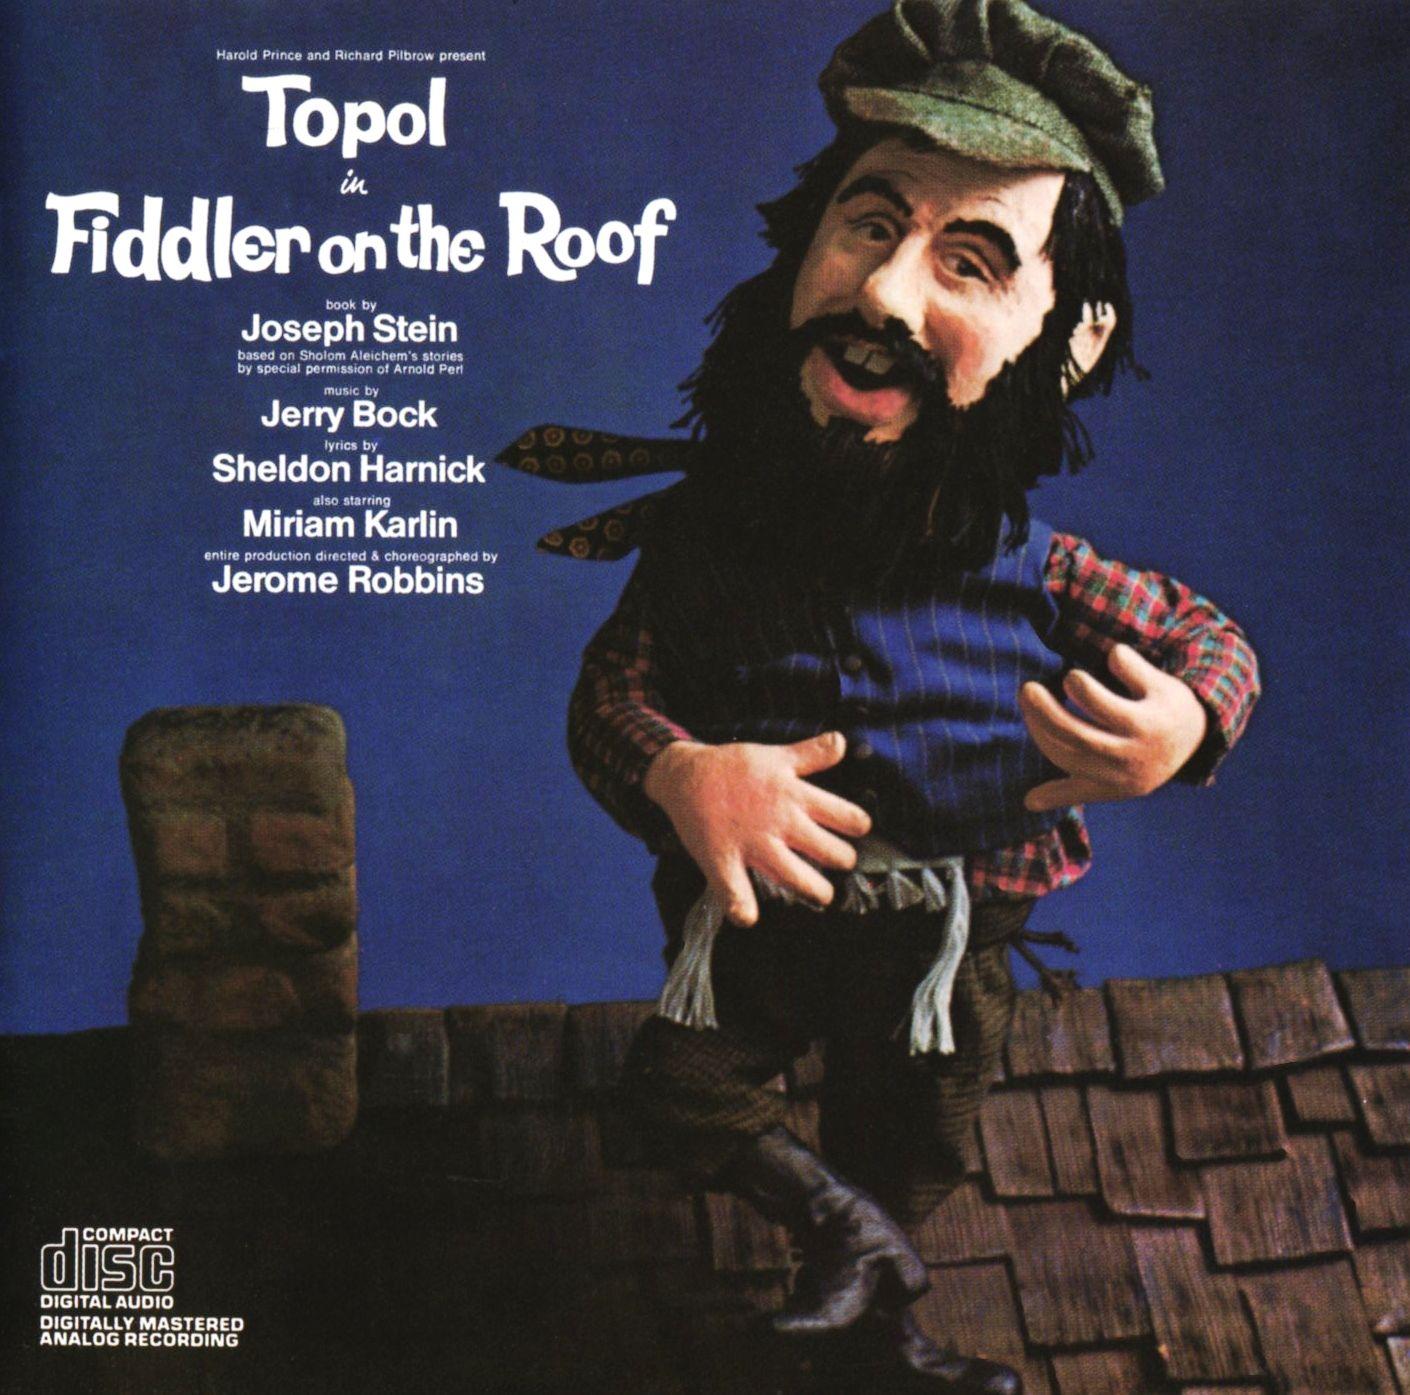 Topol in Fiddler on the Roof, Harold Prince, Richard